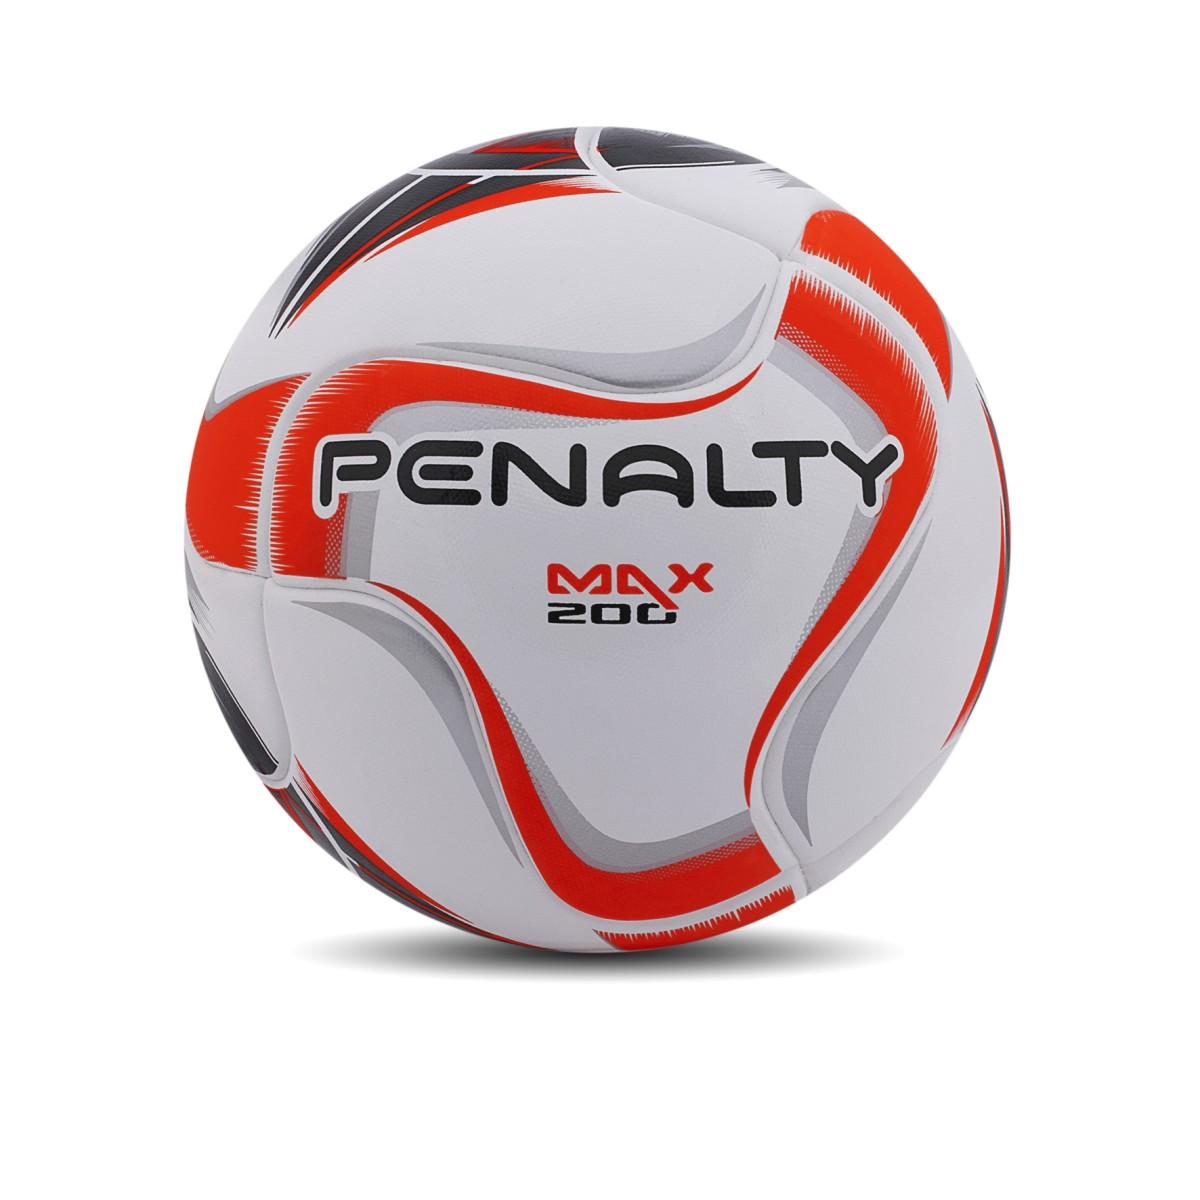 Foto 1 - Bola Penalty Futsal MAX 200 Termotec Branco, Preto e Laranja